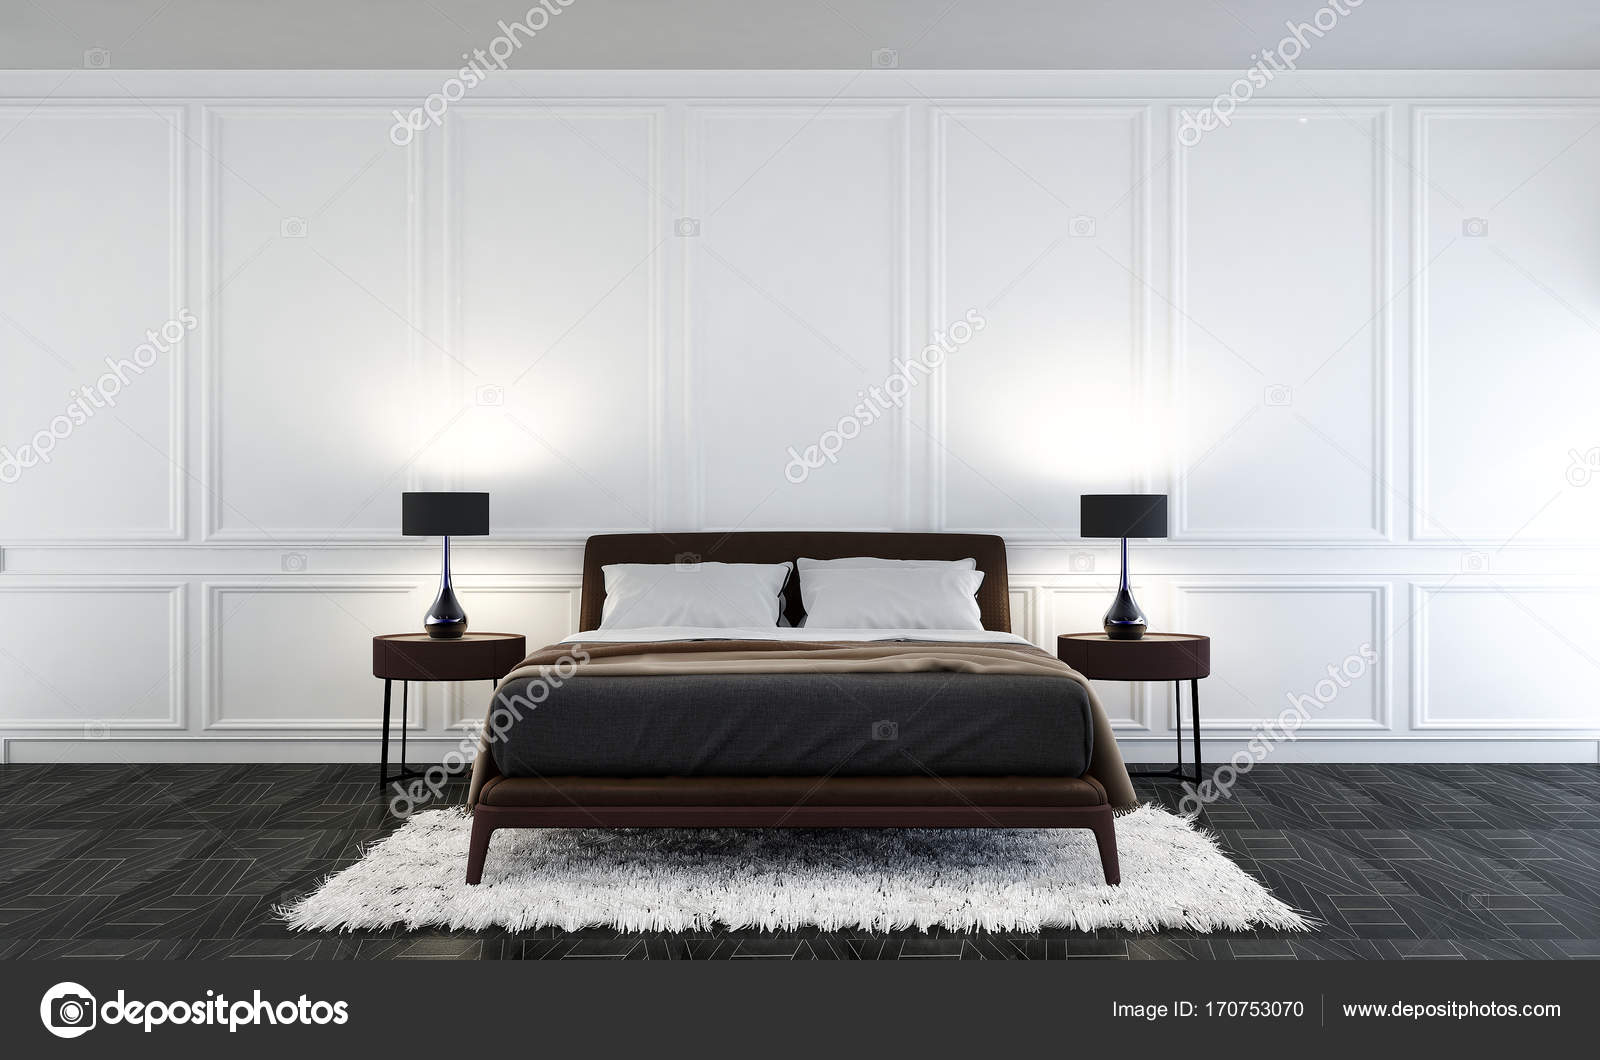 De minimale slaapkamer interieurontwerp en wit muur patroon